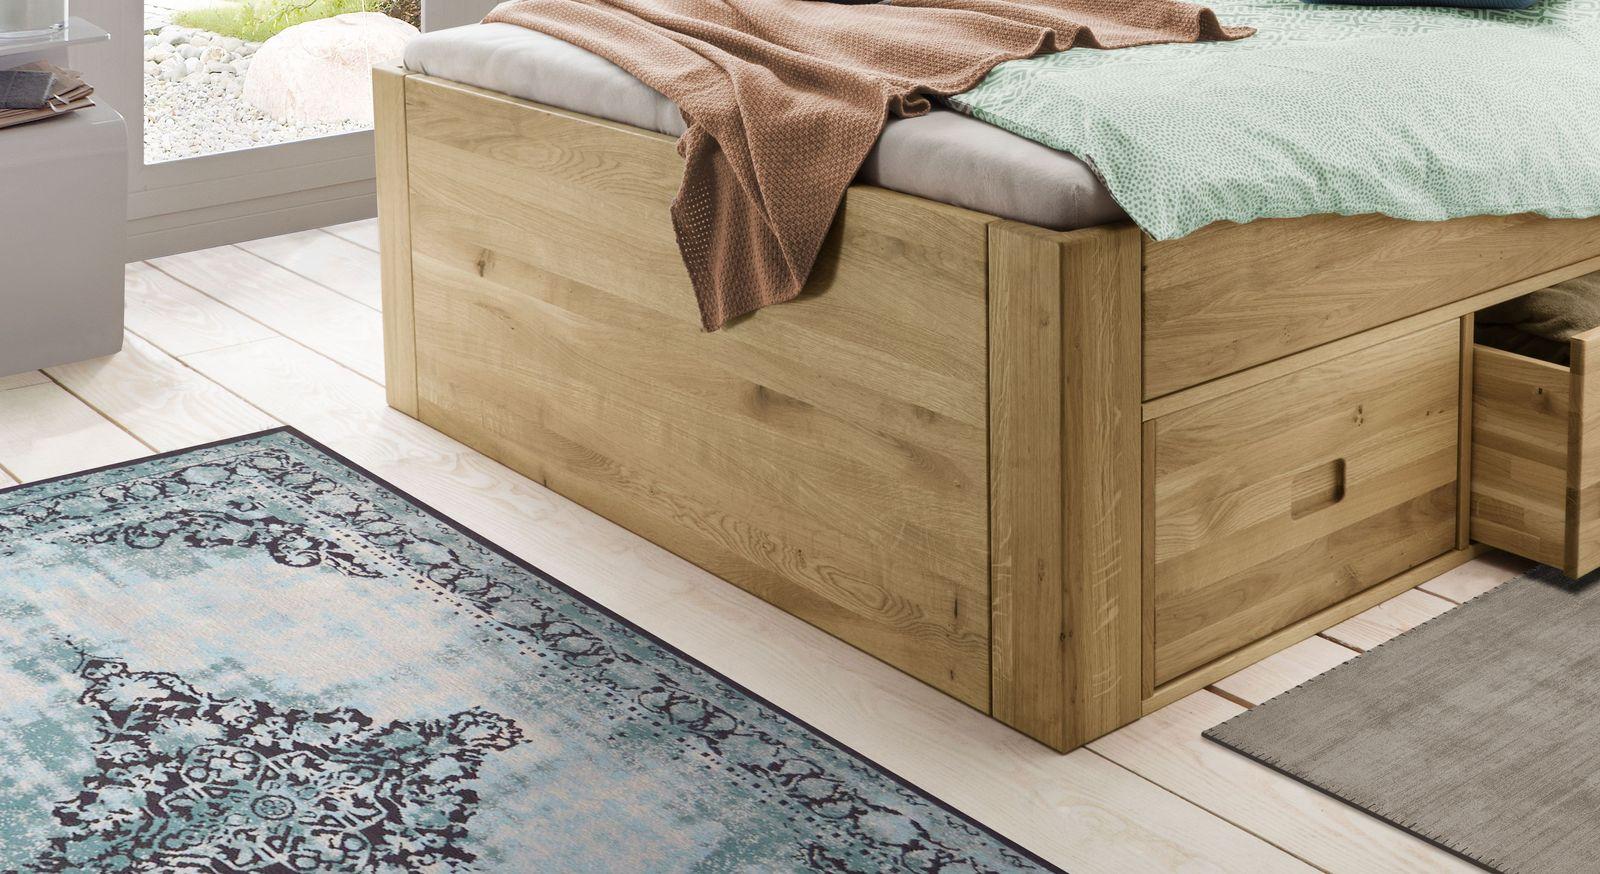 Schubkasten-Bett Blumau aus robustem Echtholz